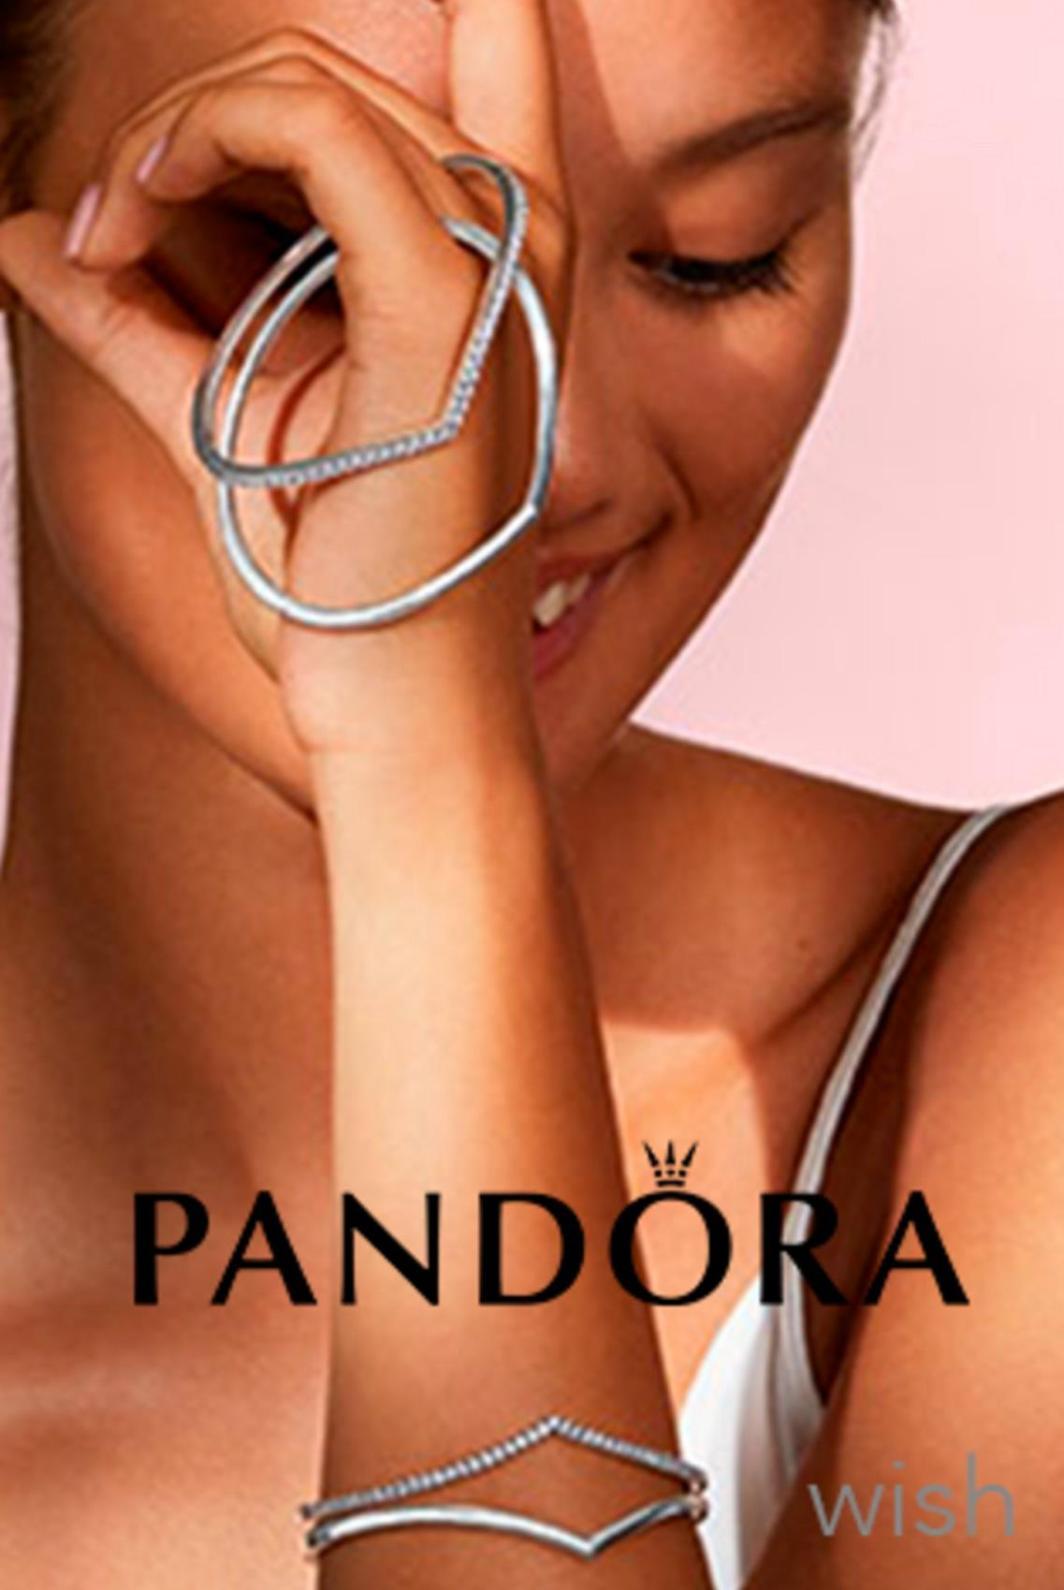 PANDORA - 2019/04/22 - Catálogo PANDORA